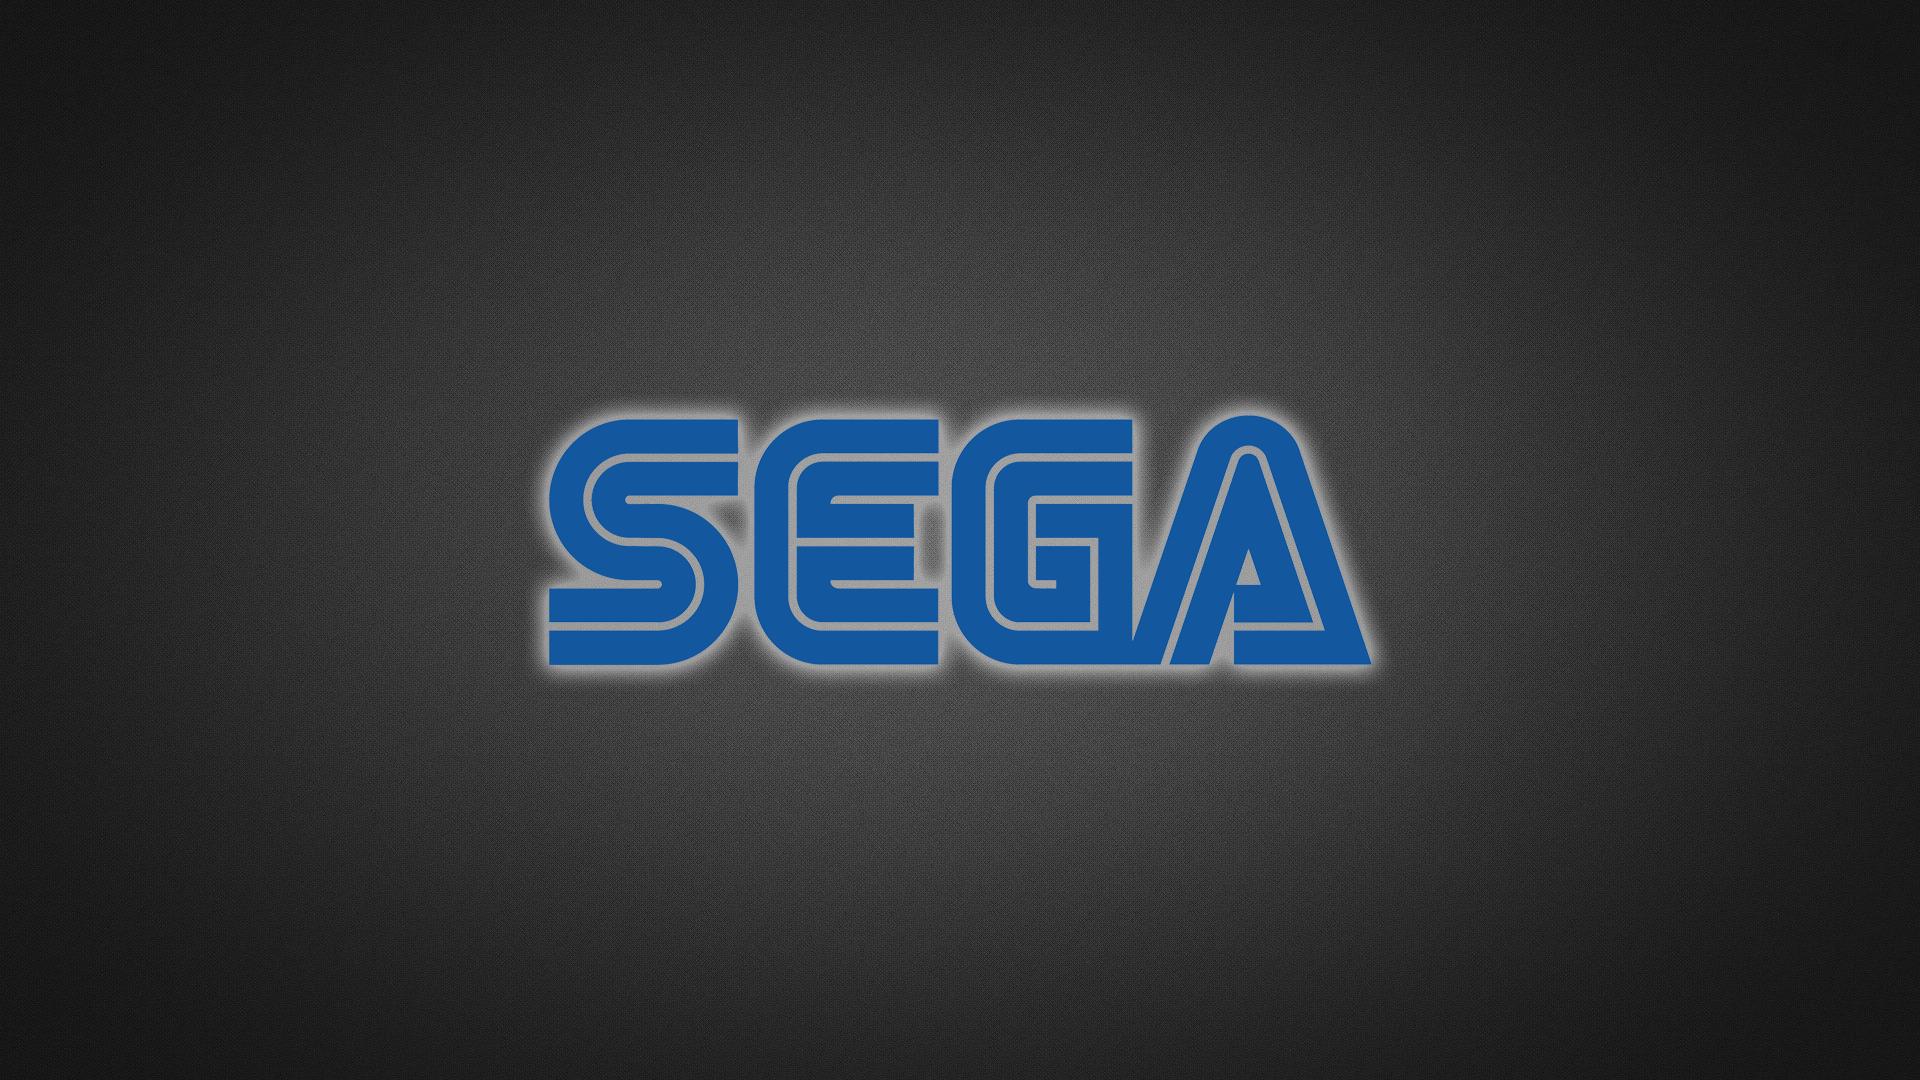 Sega Logo Wallpaper